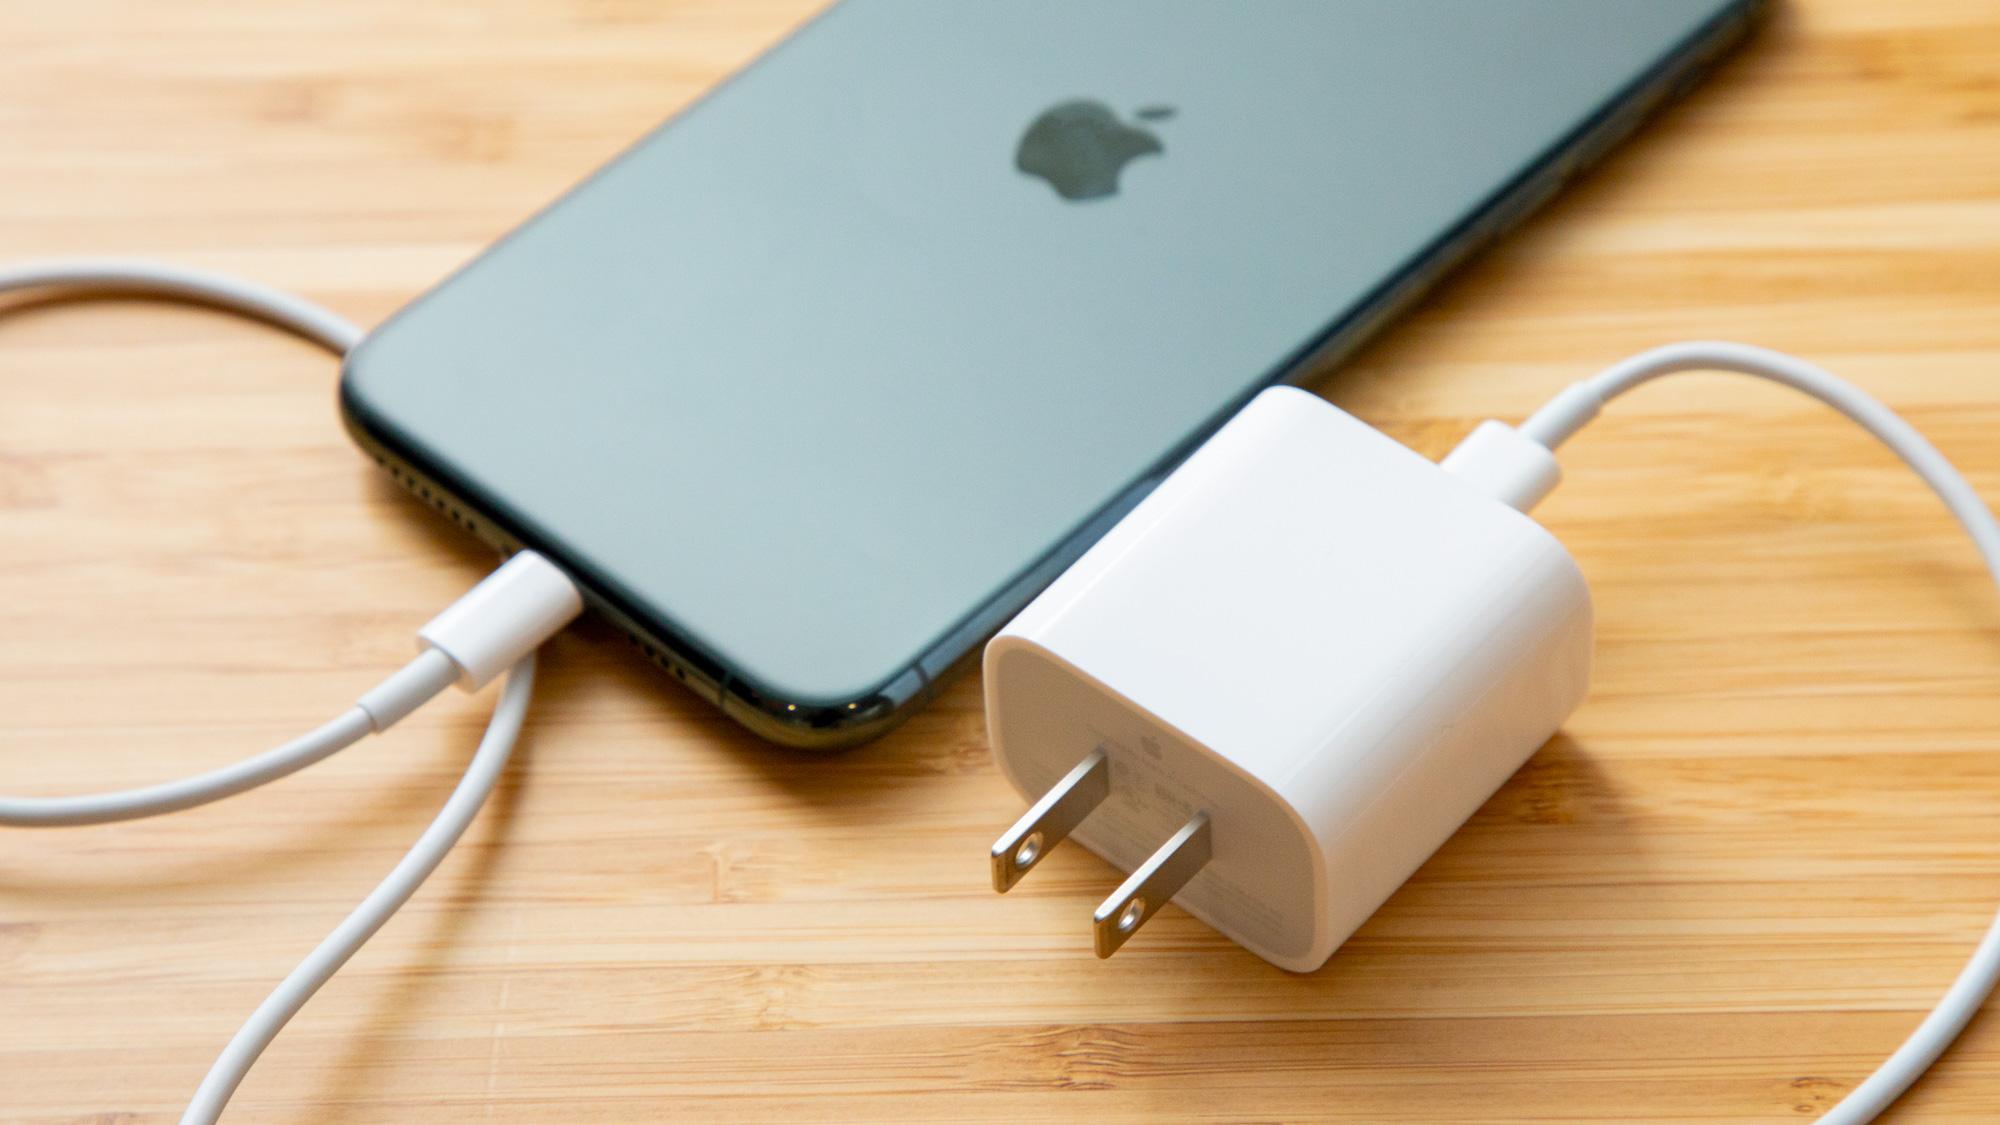 iPhone 11, iPhone XR и iPhone SE (2020), как и iPhone 12, лишились комплектного блока питания и наушников EarPods